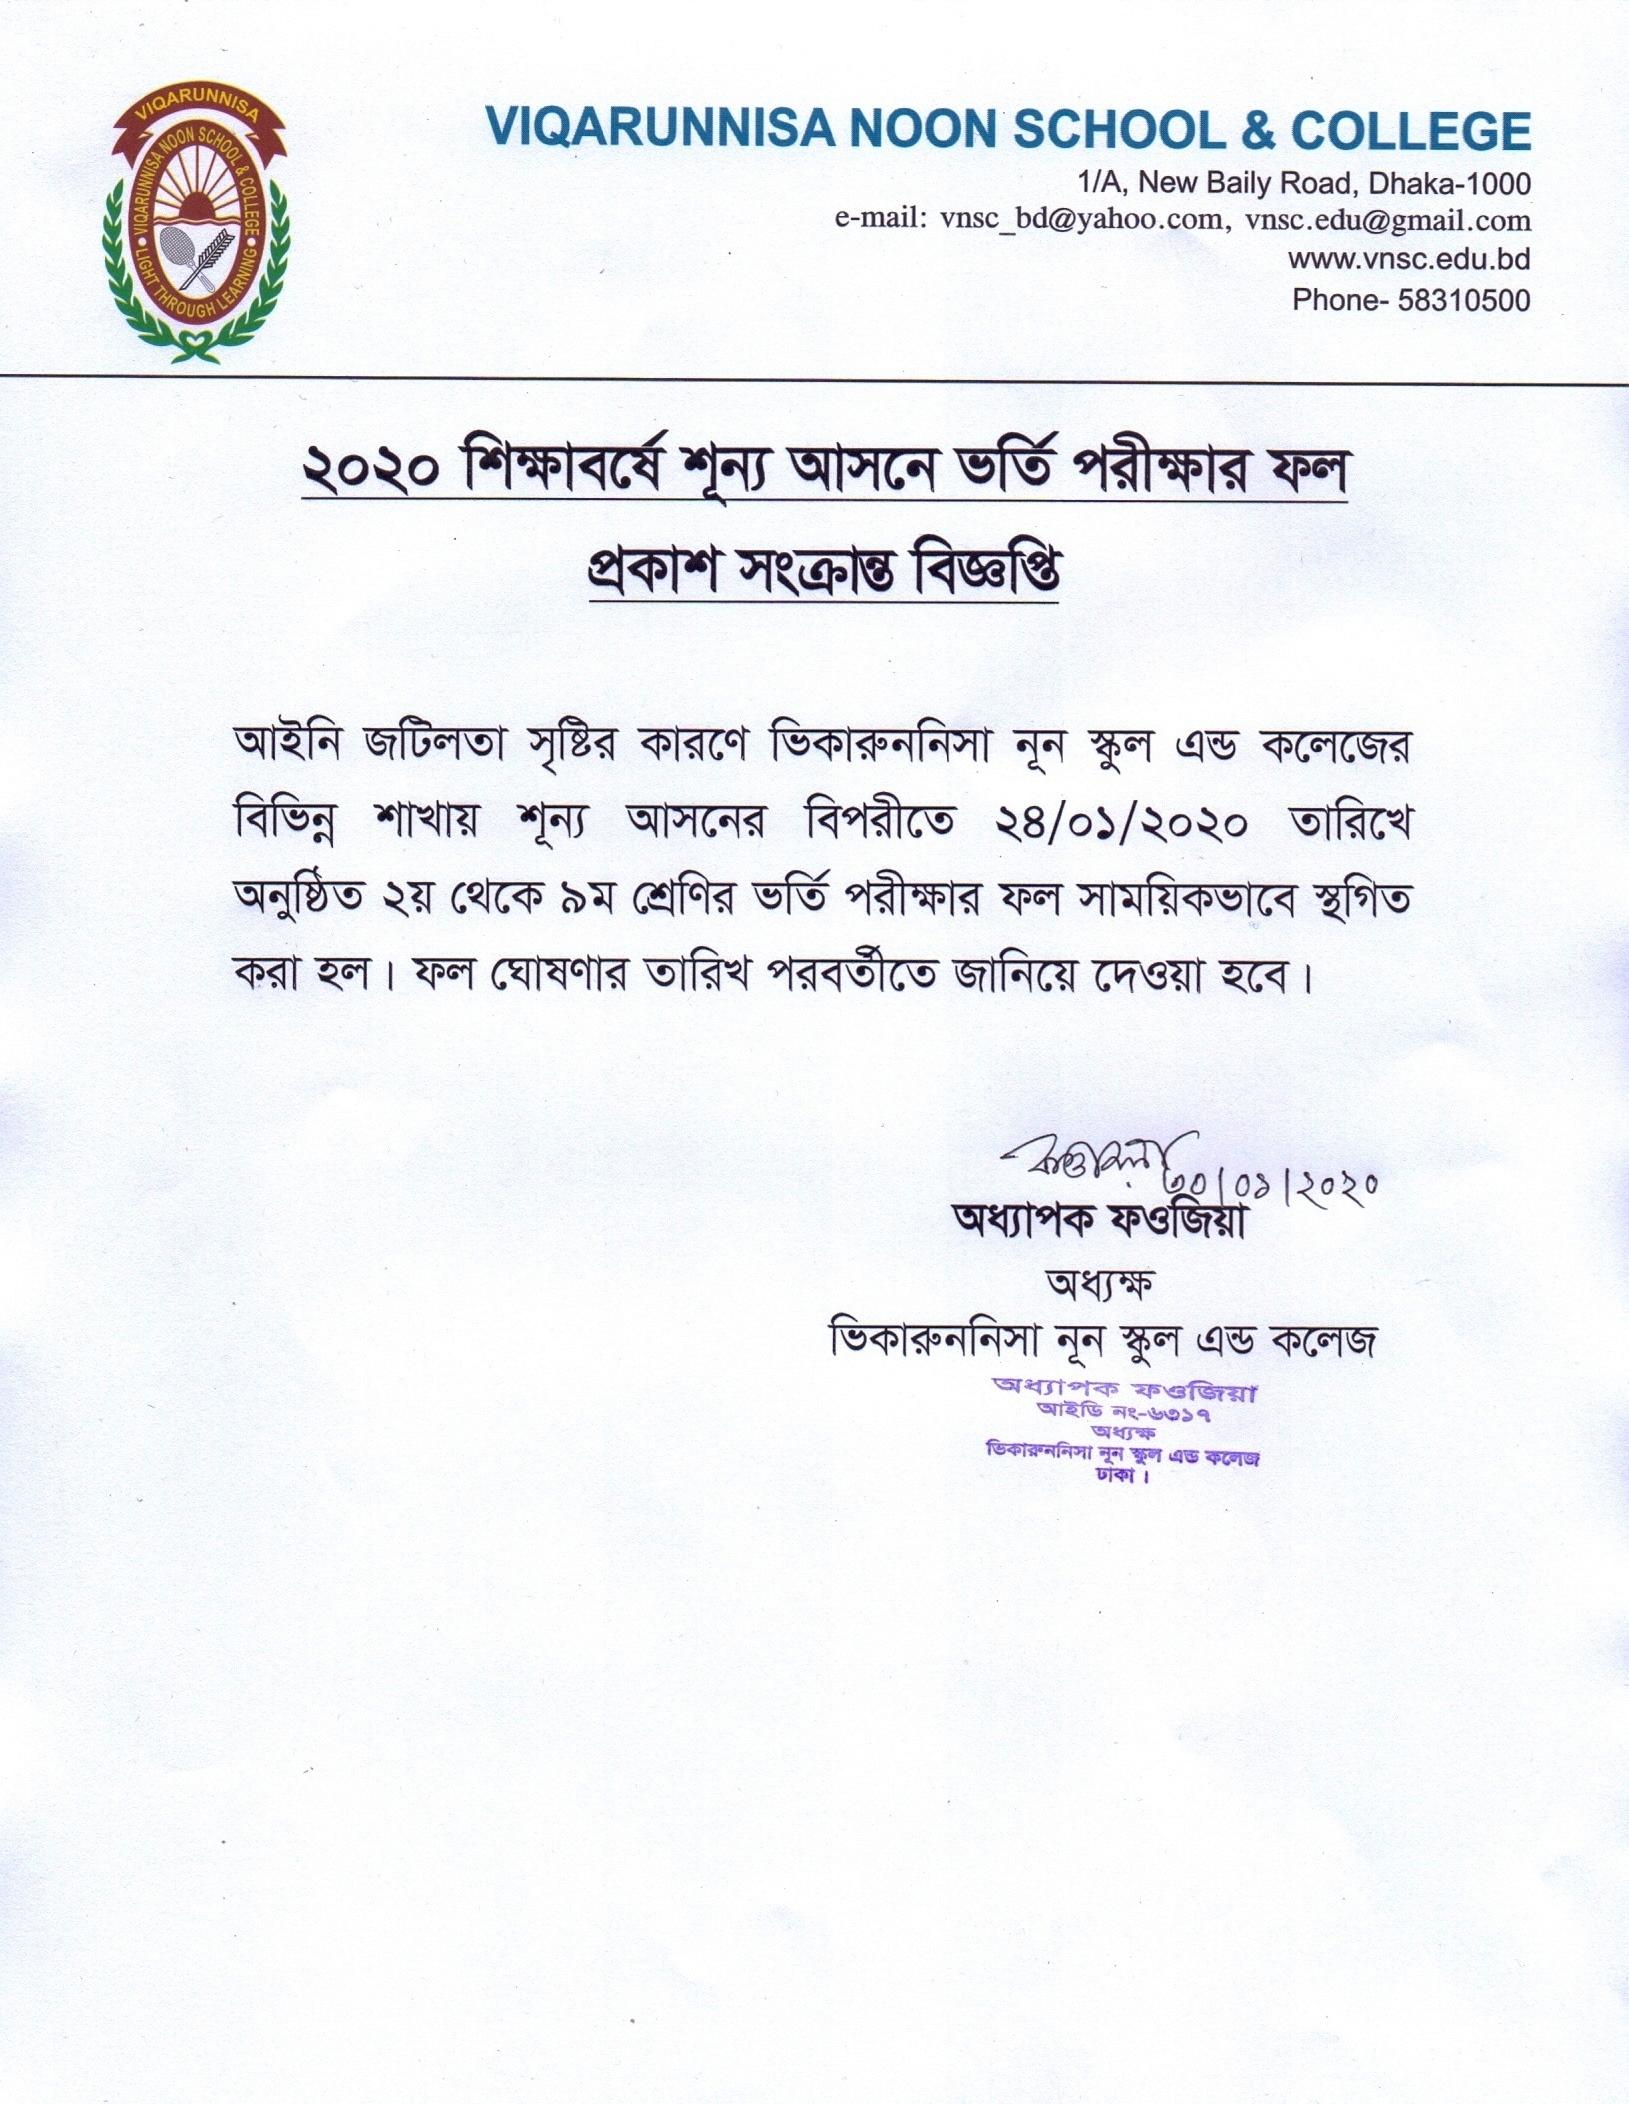 viqarunnisa noon school admission result notice